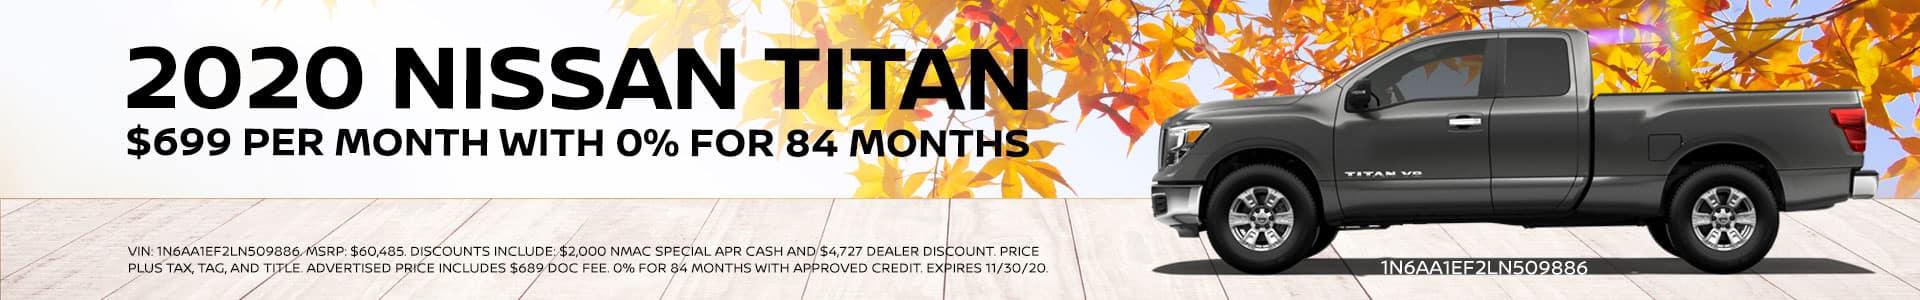 2020 Nissan Titan Special